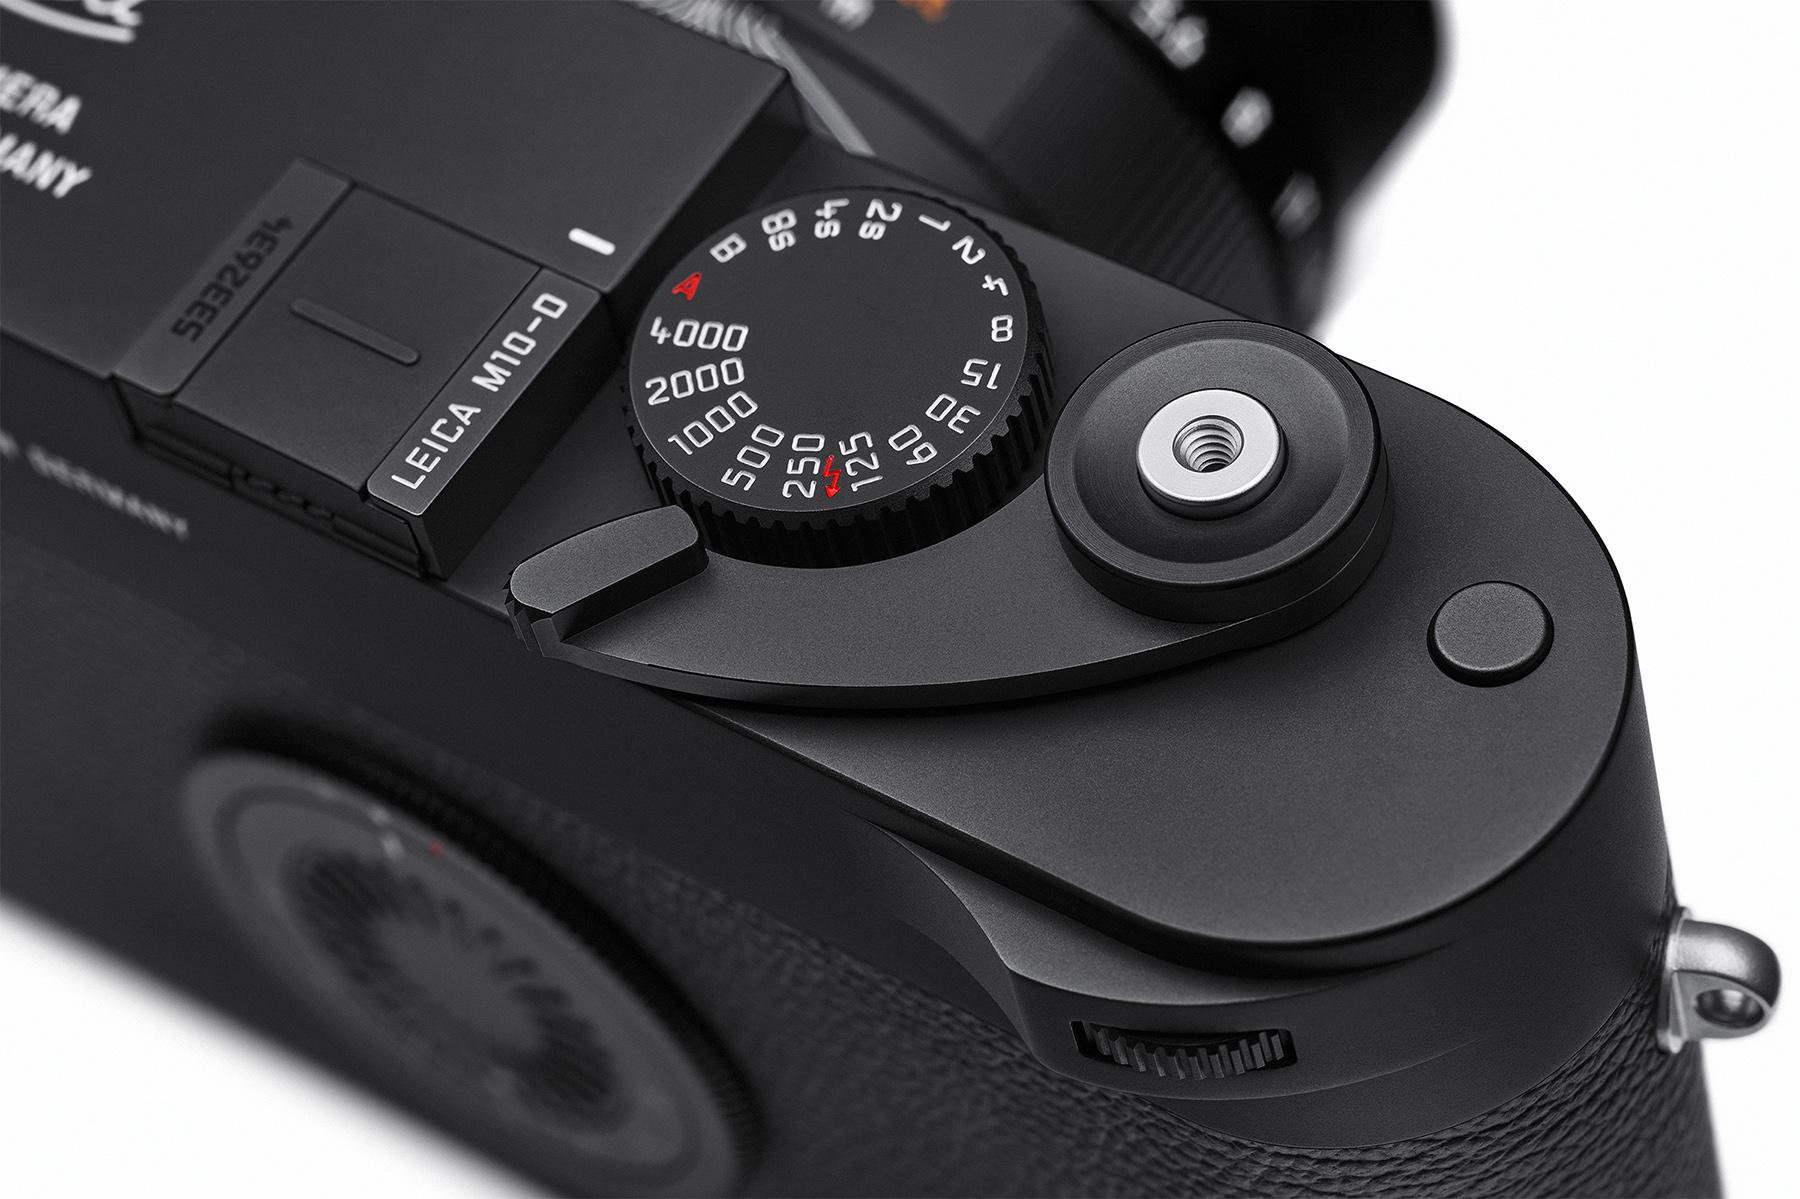 Leica_M10-D_CU_1_LoRes_sRGB.jpg